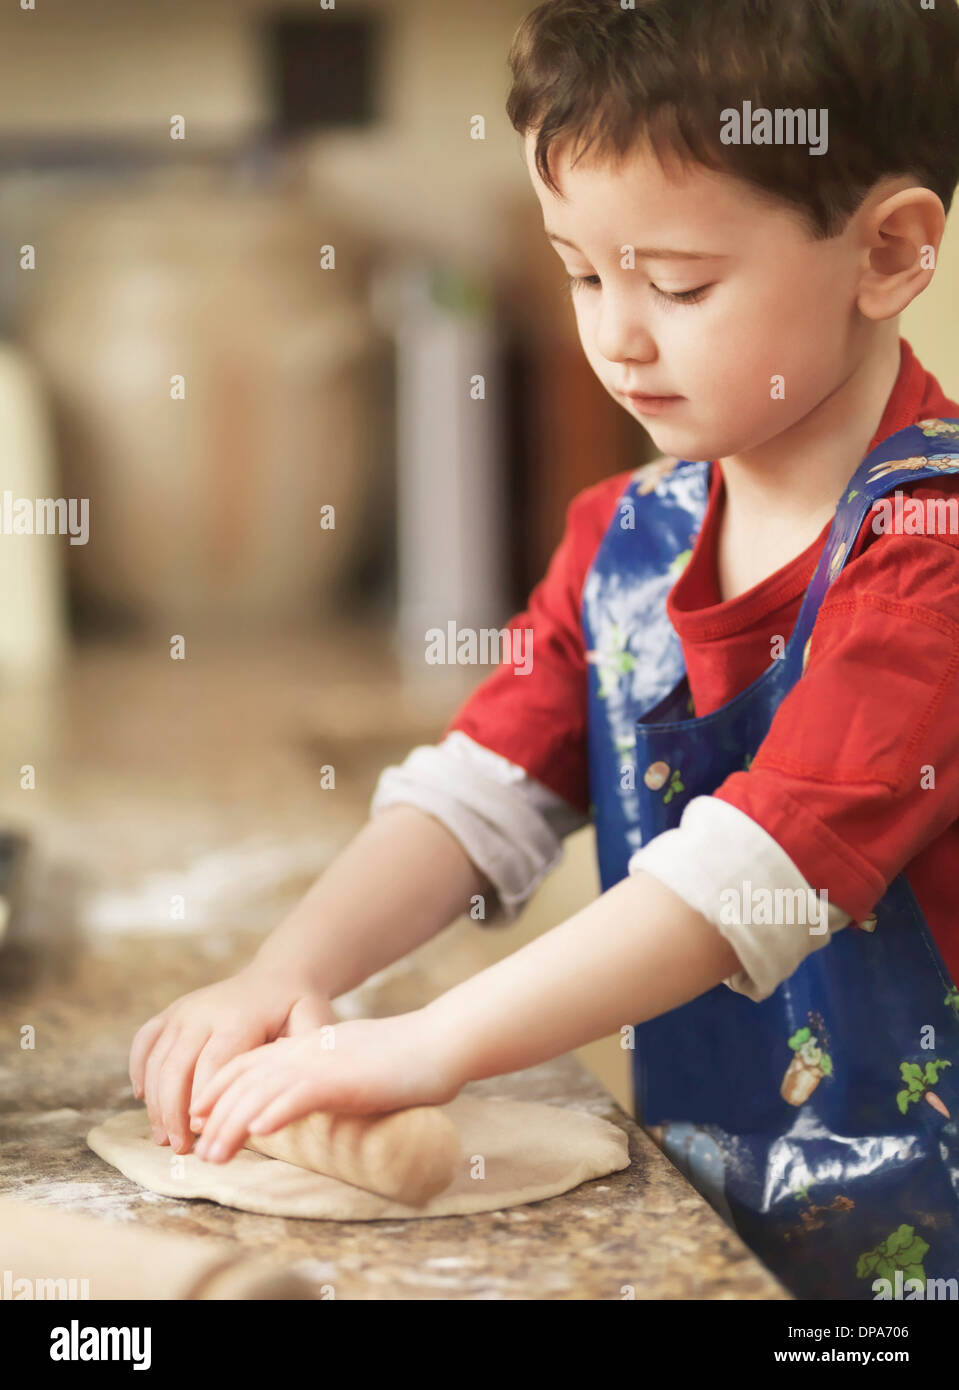 Niño amasar la masa con rodillo Imagen De Stock